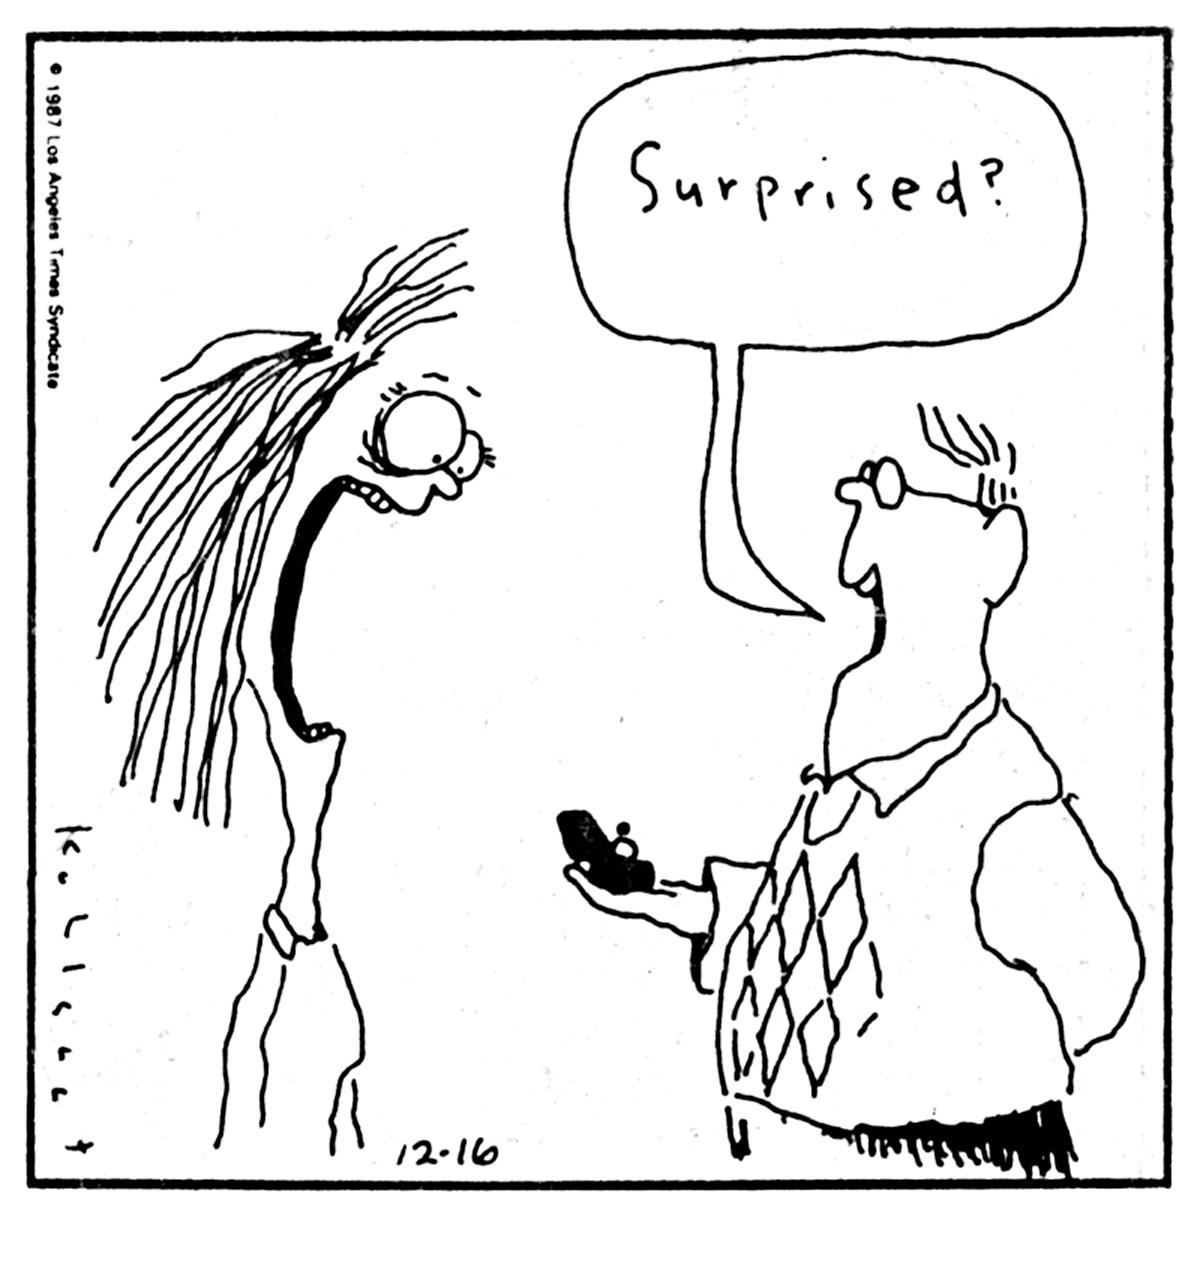 surprised cartoon invitation proposal